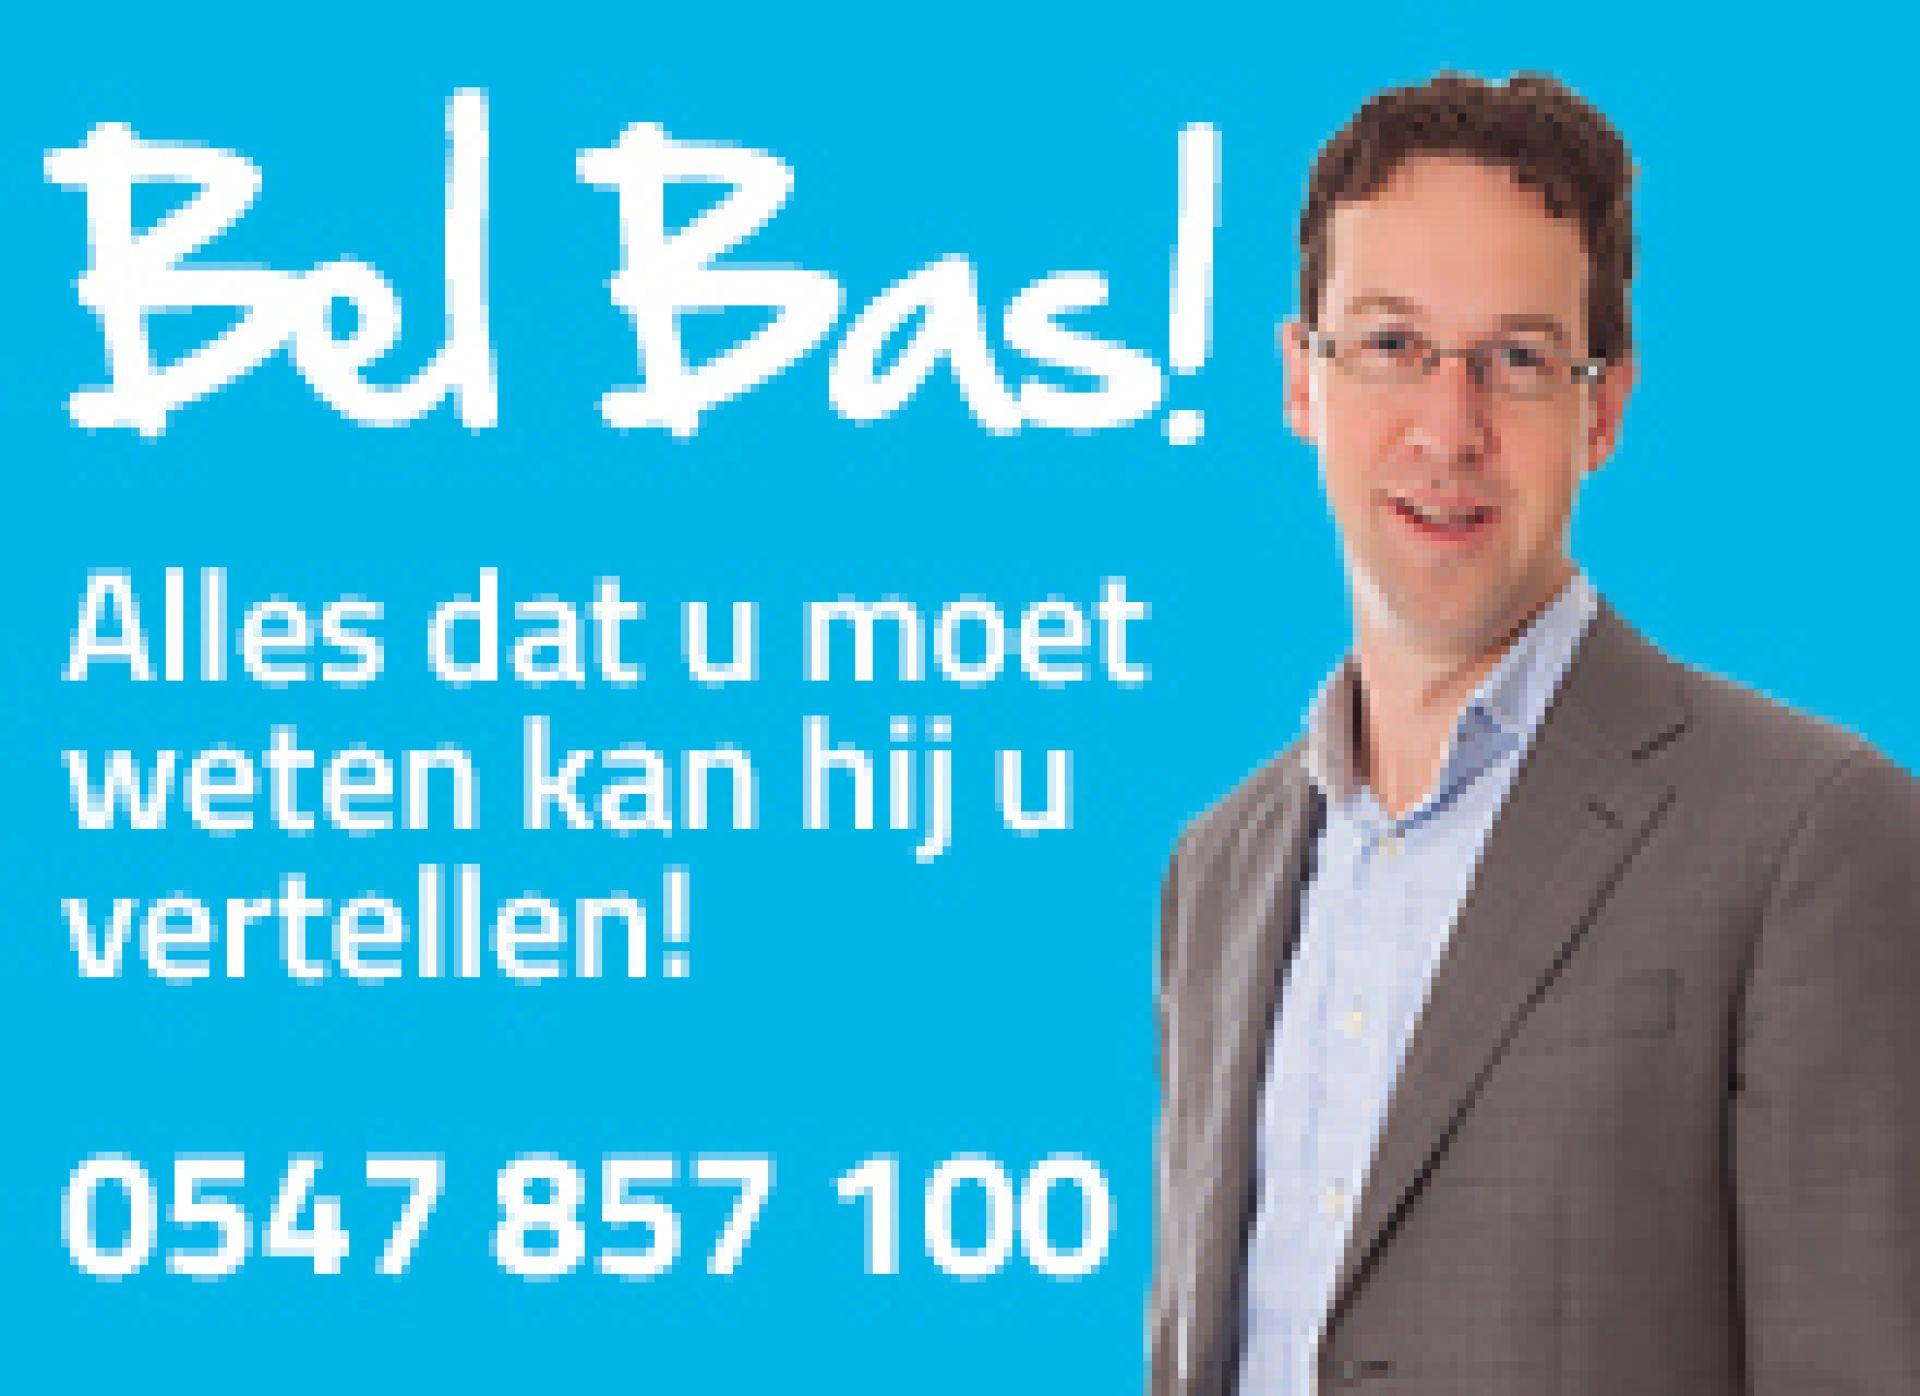 Bel Bas